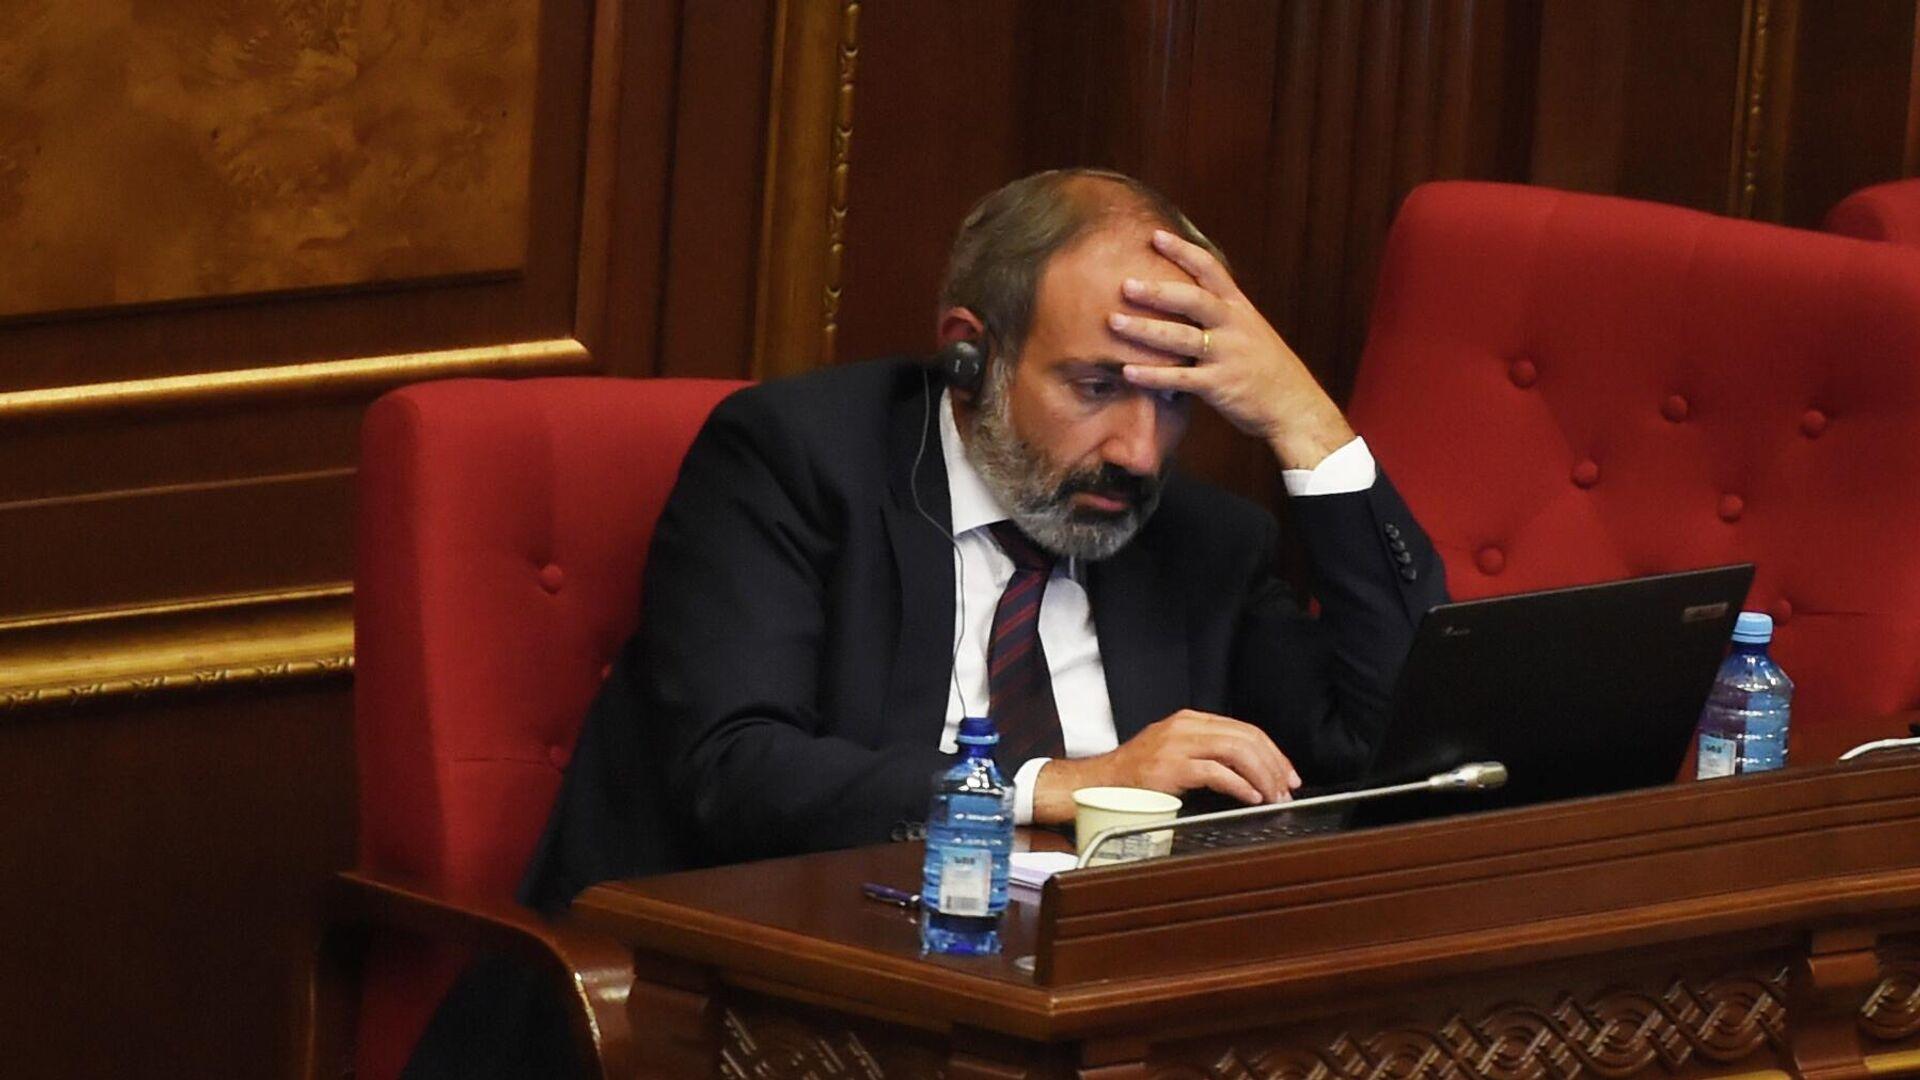 Никол Пашинян на заседании  в парламенте Армении - РИА Новости, 1920, 13.06.2021